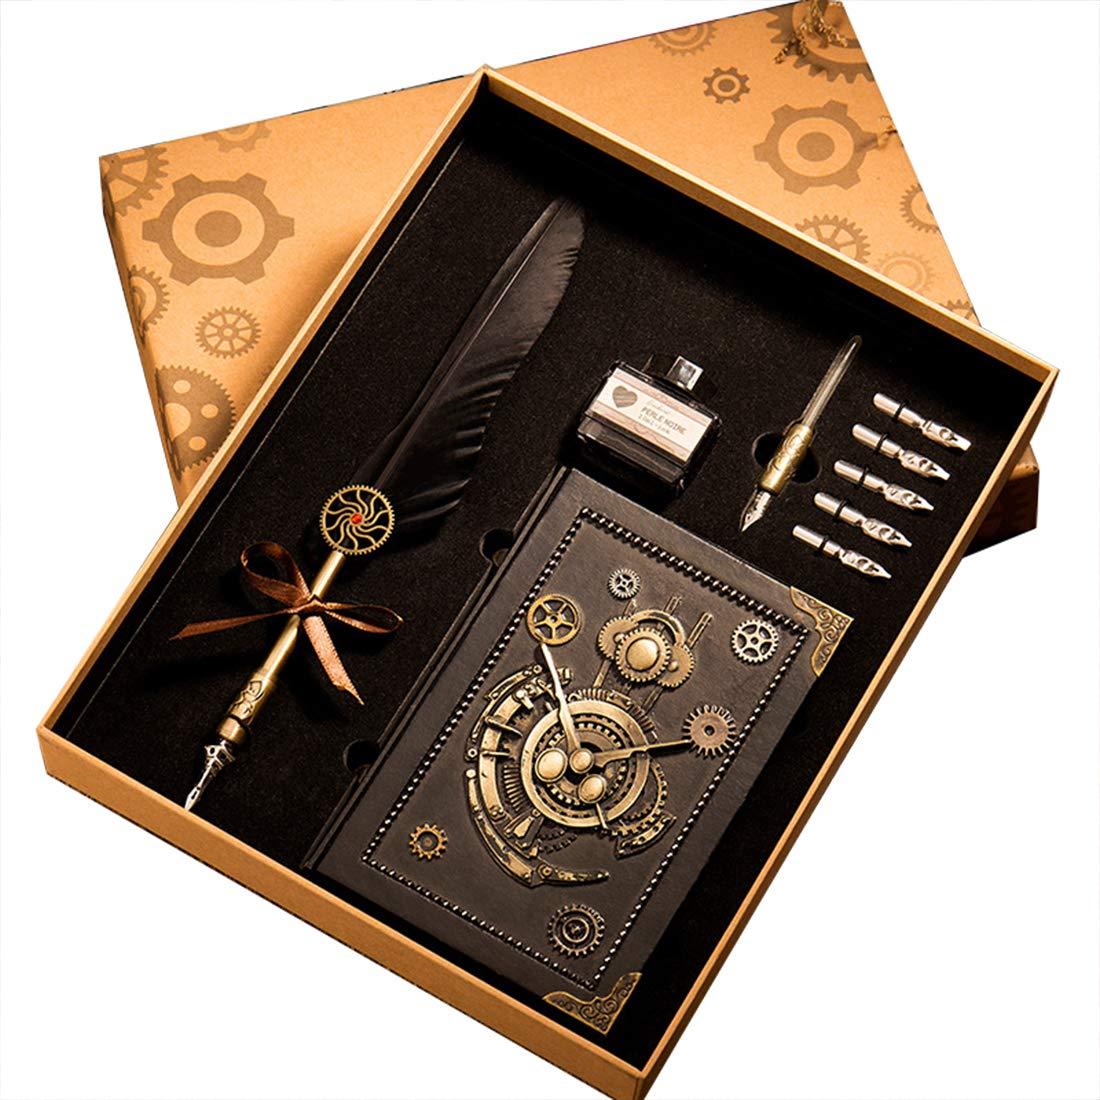 HENHEN Feather Quill Pen Set - 100% Hand Craft - Steampunk Quill Pen and Notebook Set, in Gift Box by HENHEN (Image #1)